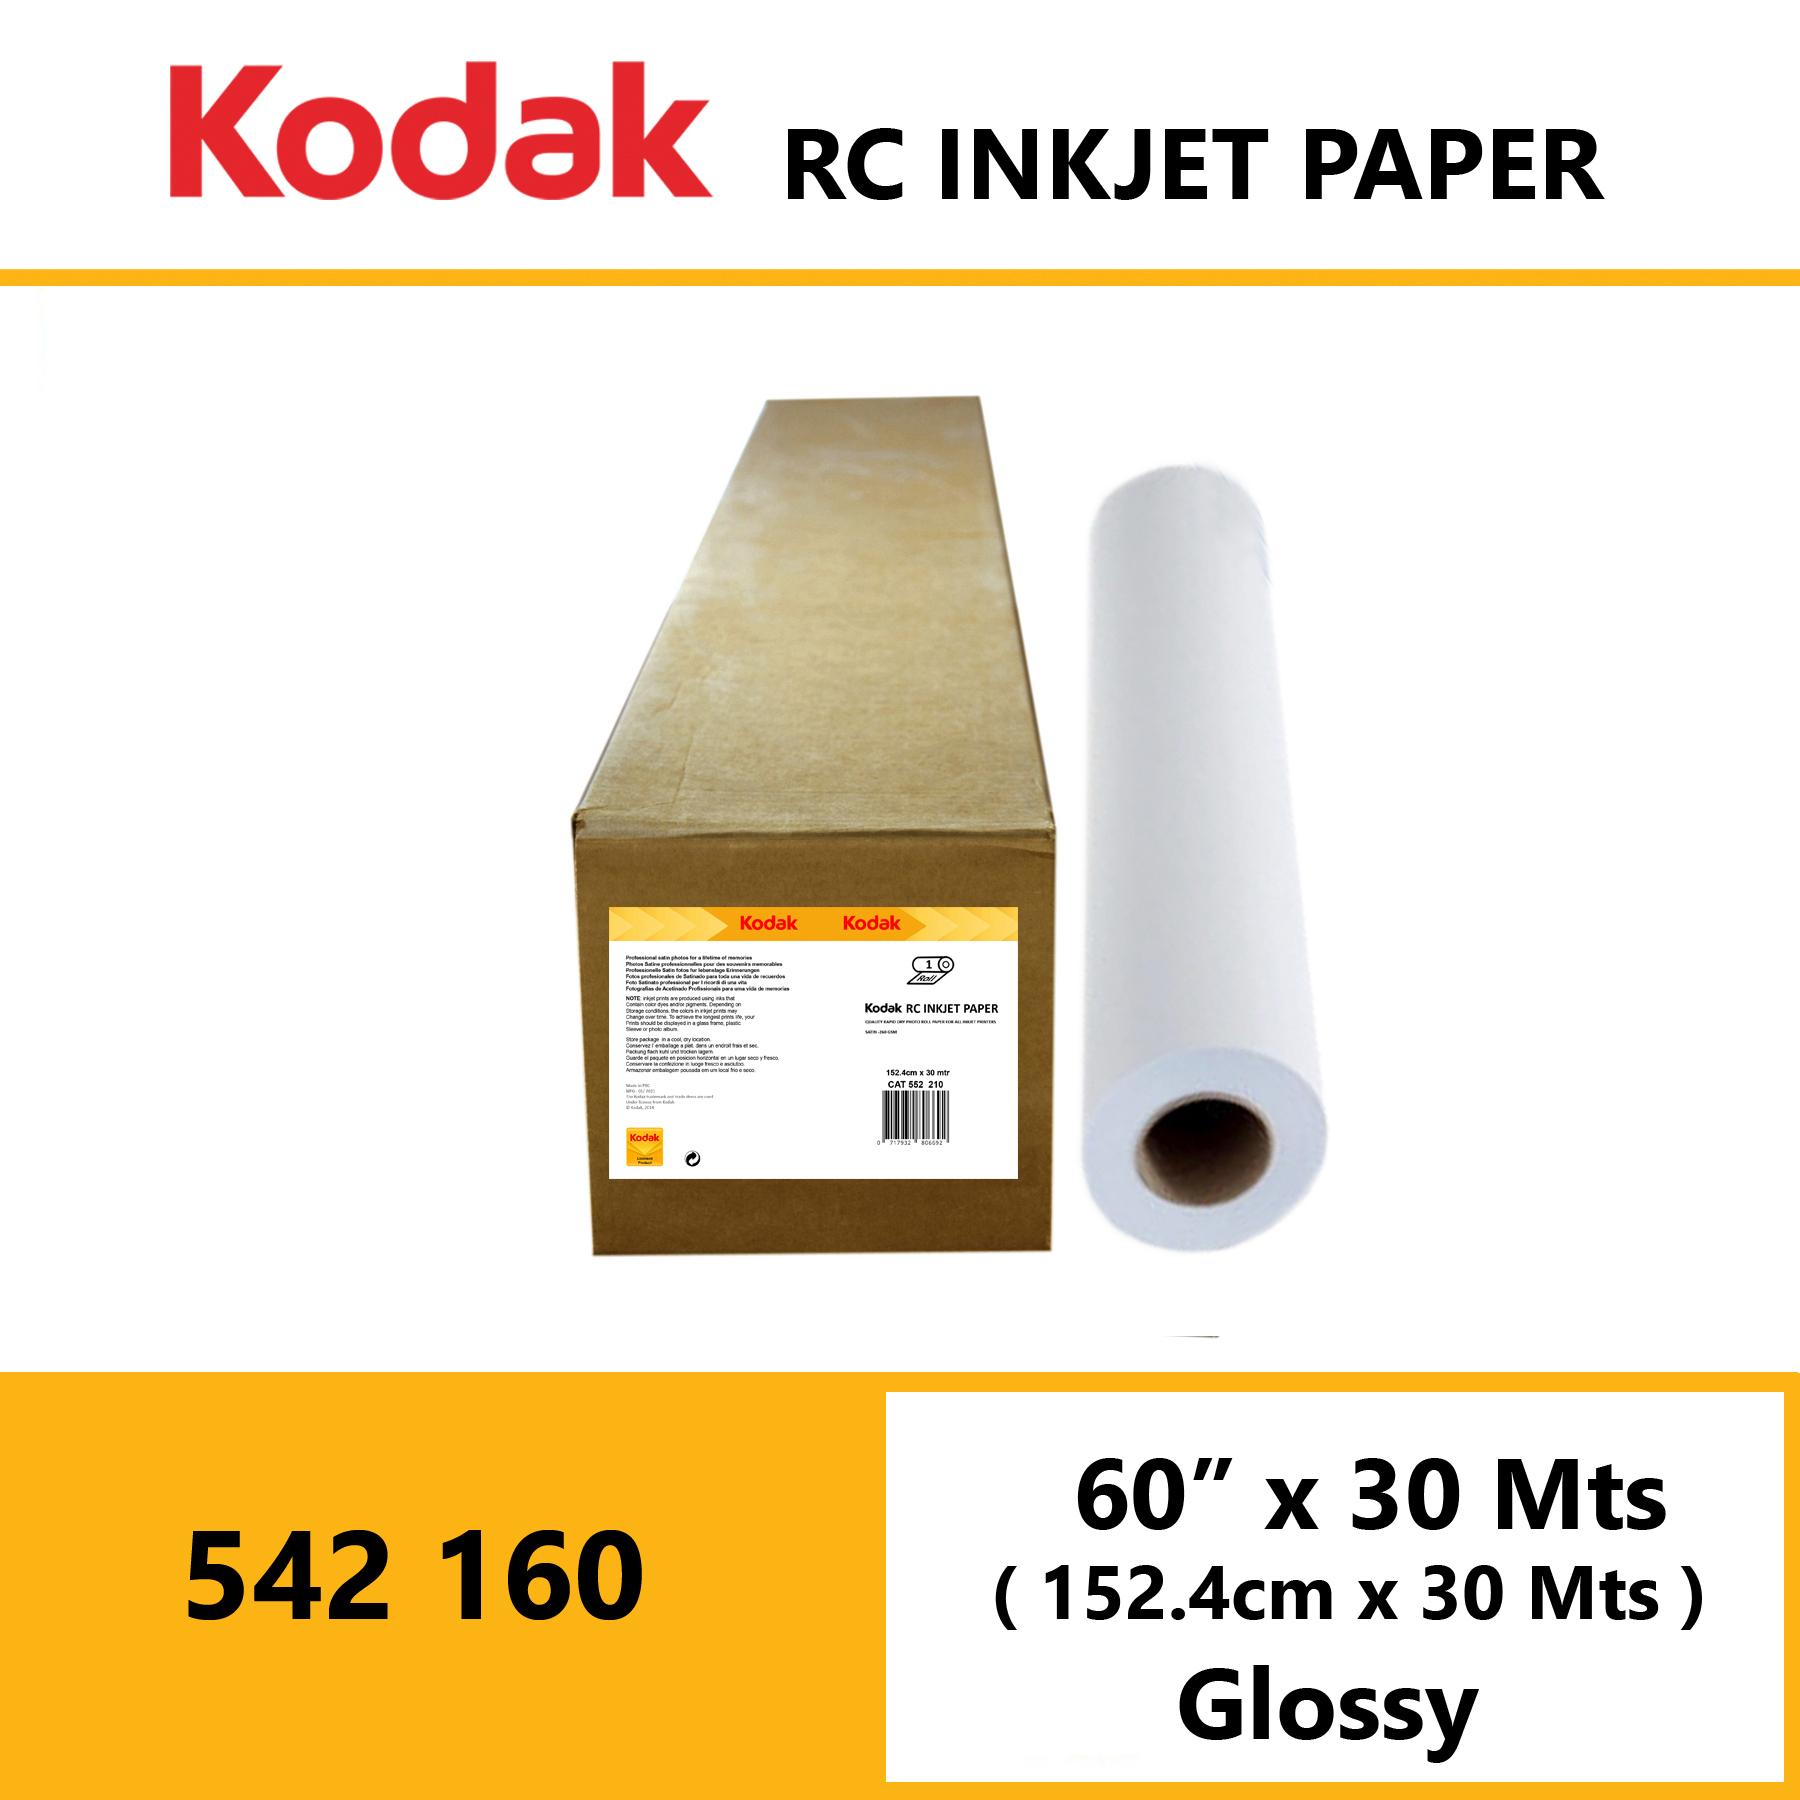 "Kodak Inkjet RC Paper 60"" x 30 Mtrs Glossy"